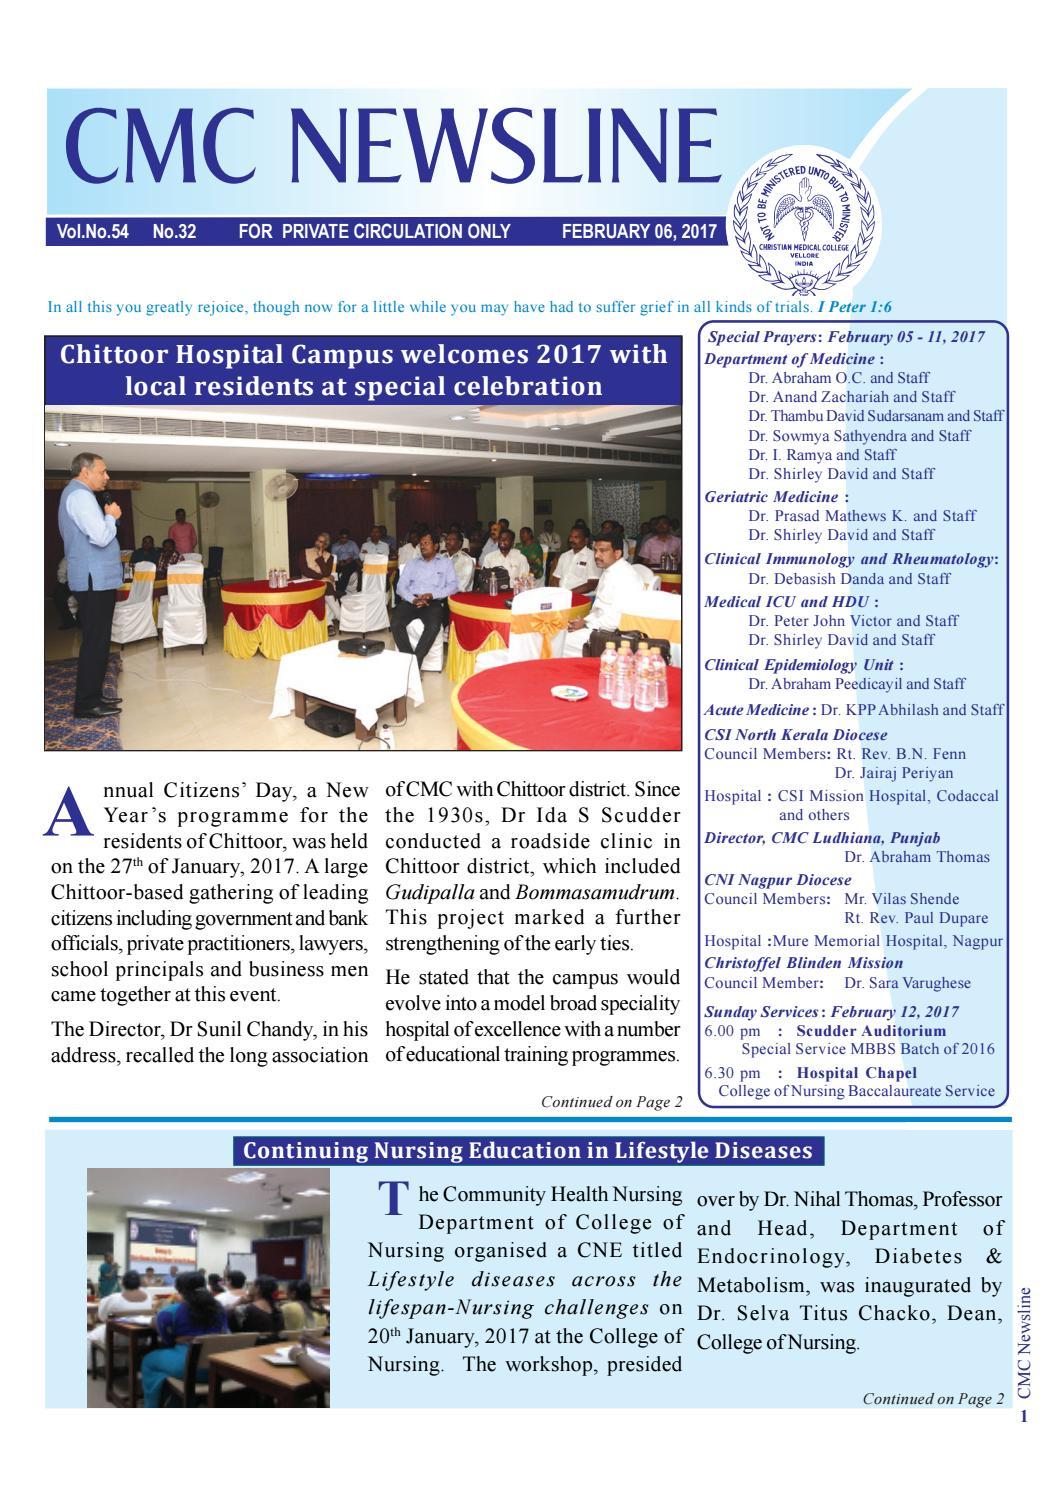 Cmc newsline 7 february 2017 vol no 54 no 32 by vellore cmc cmc newsline 7 february 2017 vol no 54 no 32 by vellore cmc foundation issuu aiddatafo Choice Image